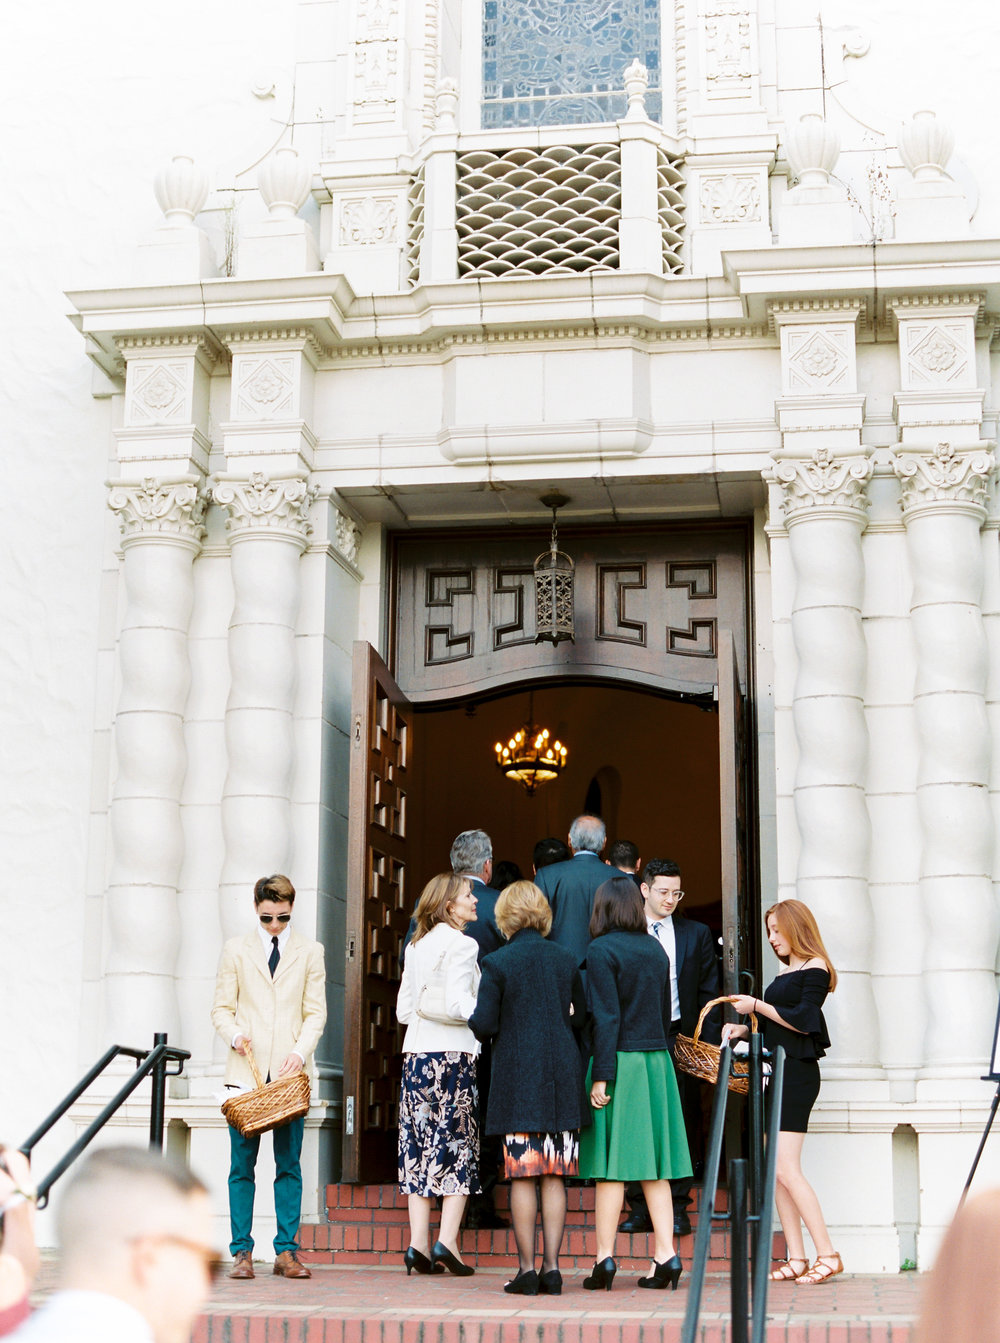 Log-cabin-wedding-in-presidio-san-francisco-california-desintation-wedding-photography-96.jpg